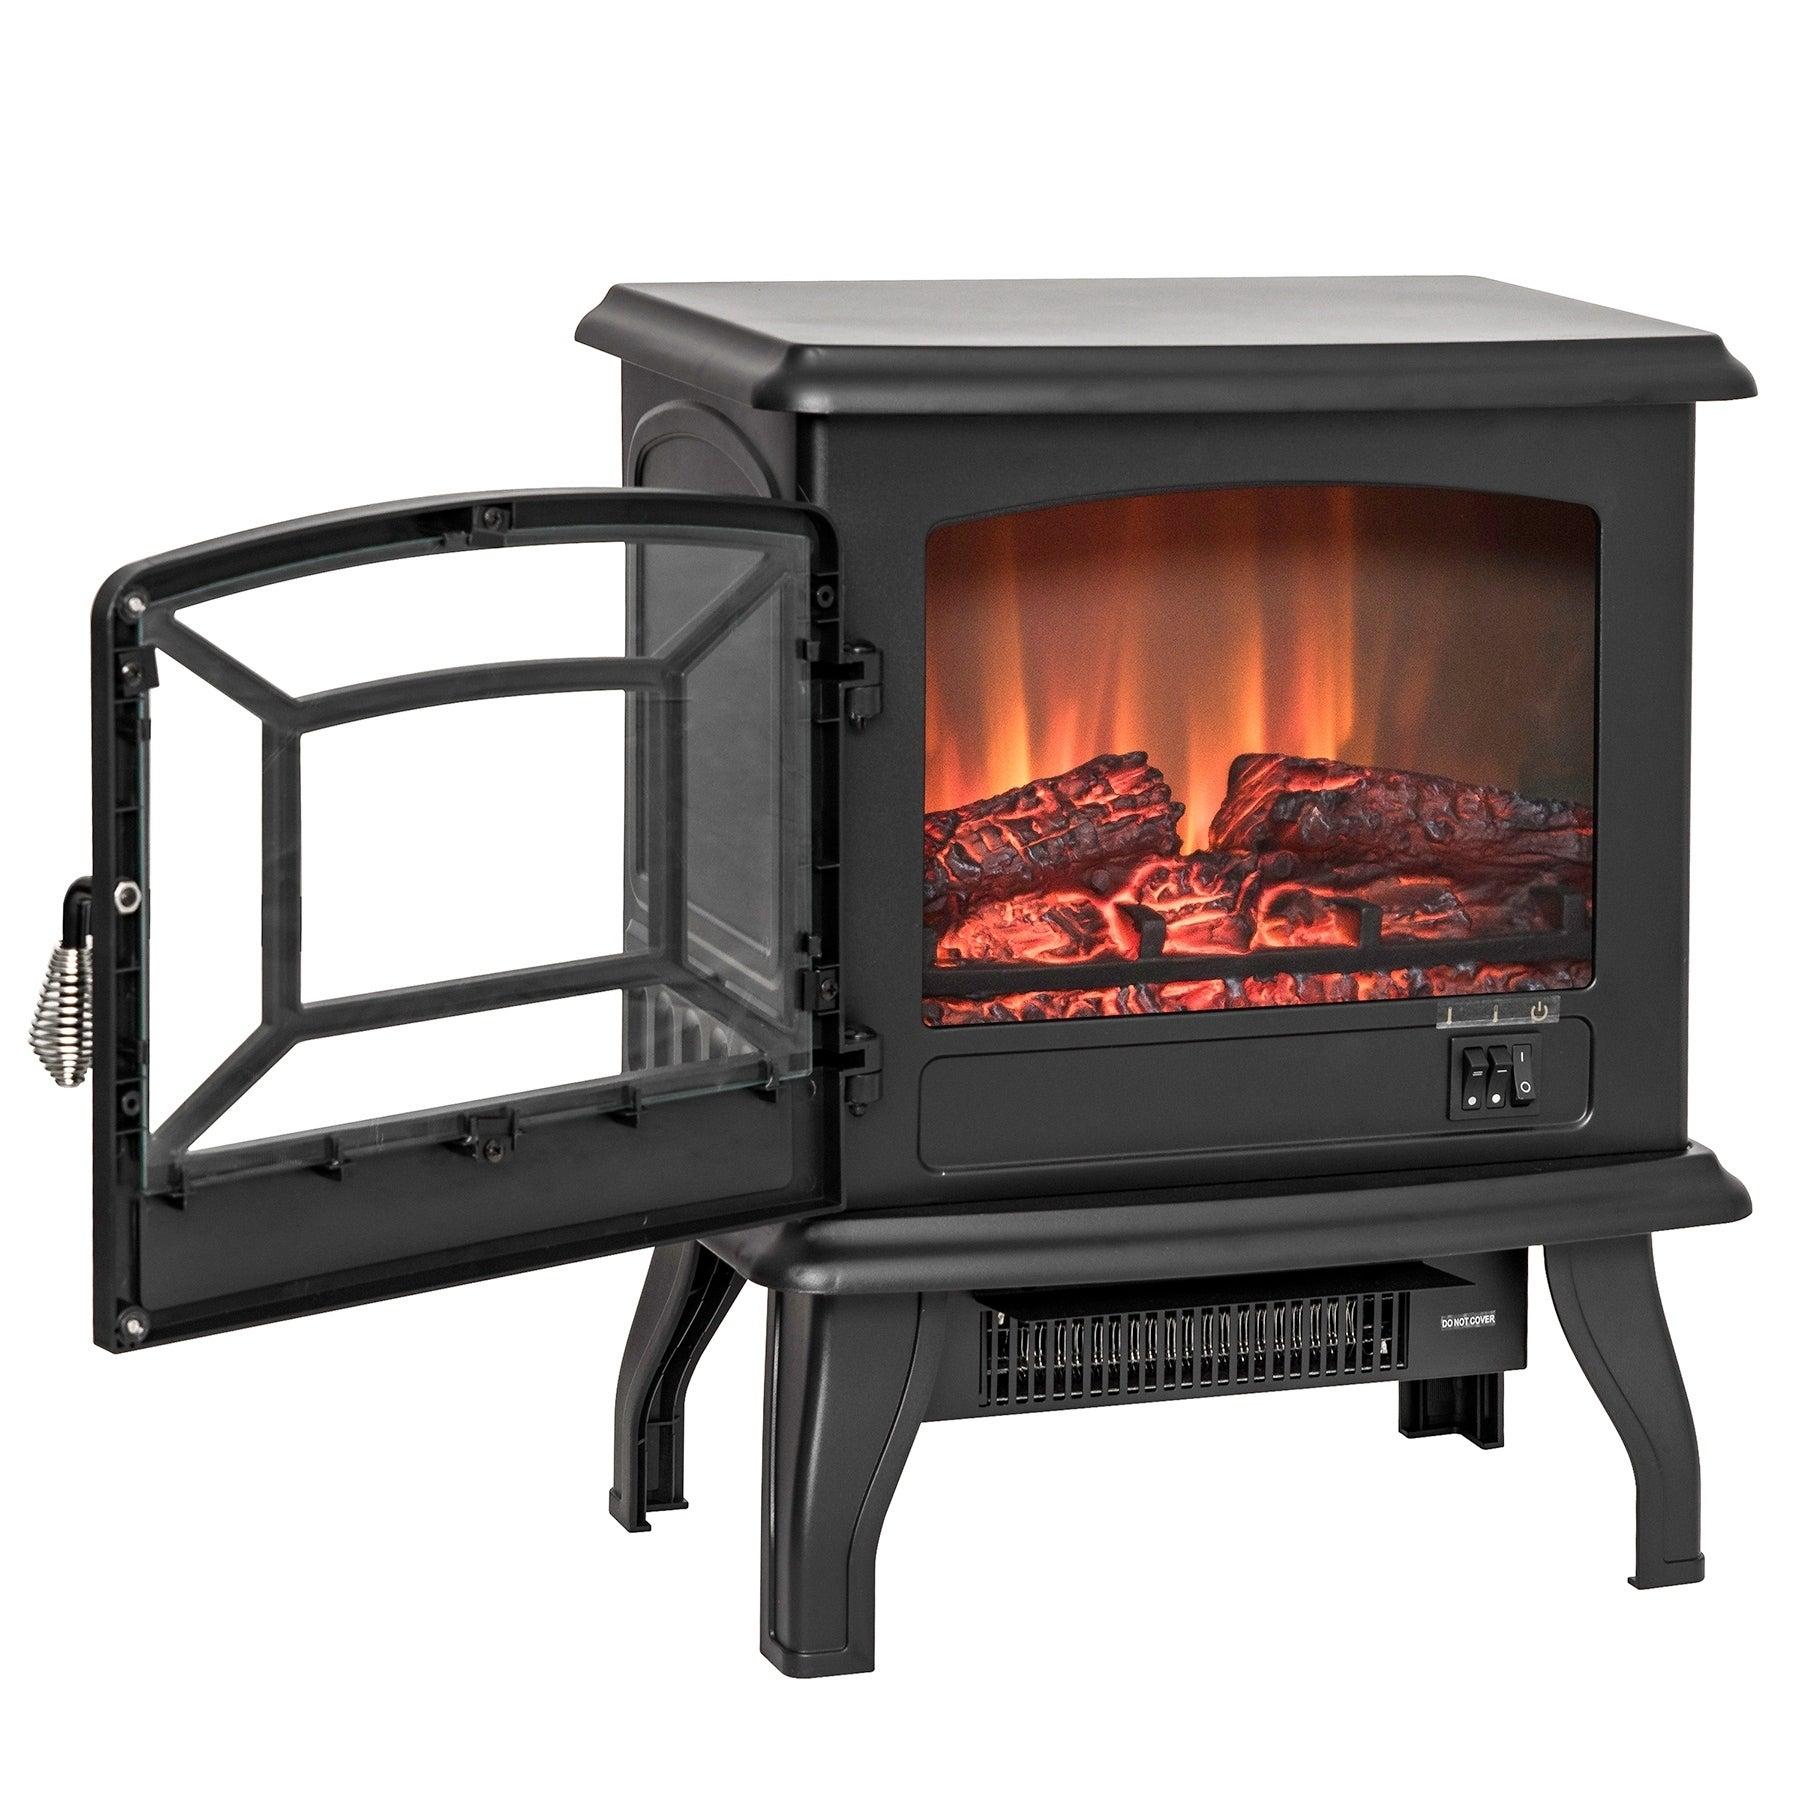 AKDY FP0078 17 Freestanding Portable Electric Fireplace 3D Flames Firebox w Logs Heater b59f183d 8c5c 41fe b60e 4f e528